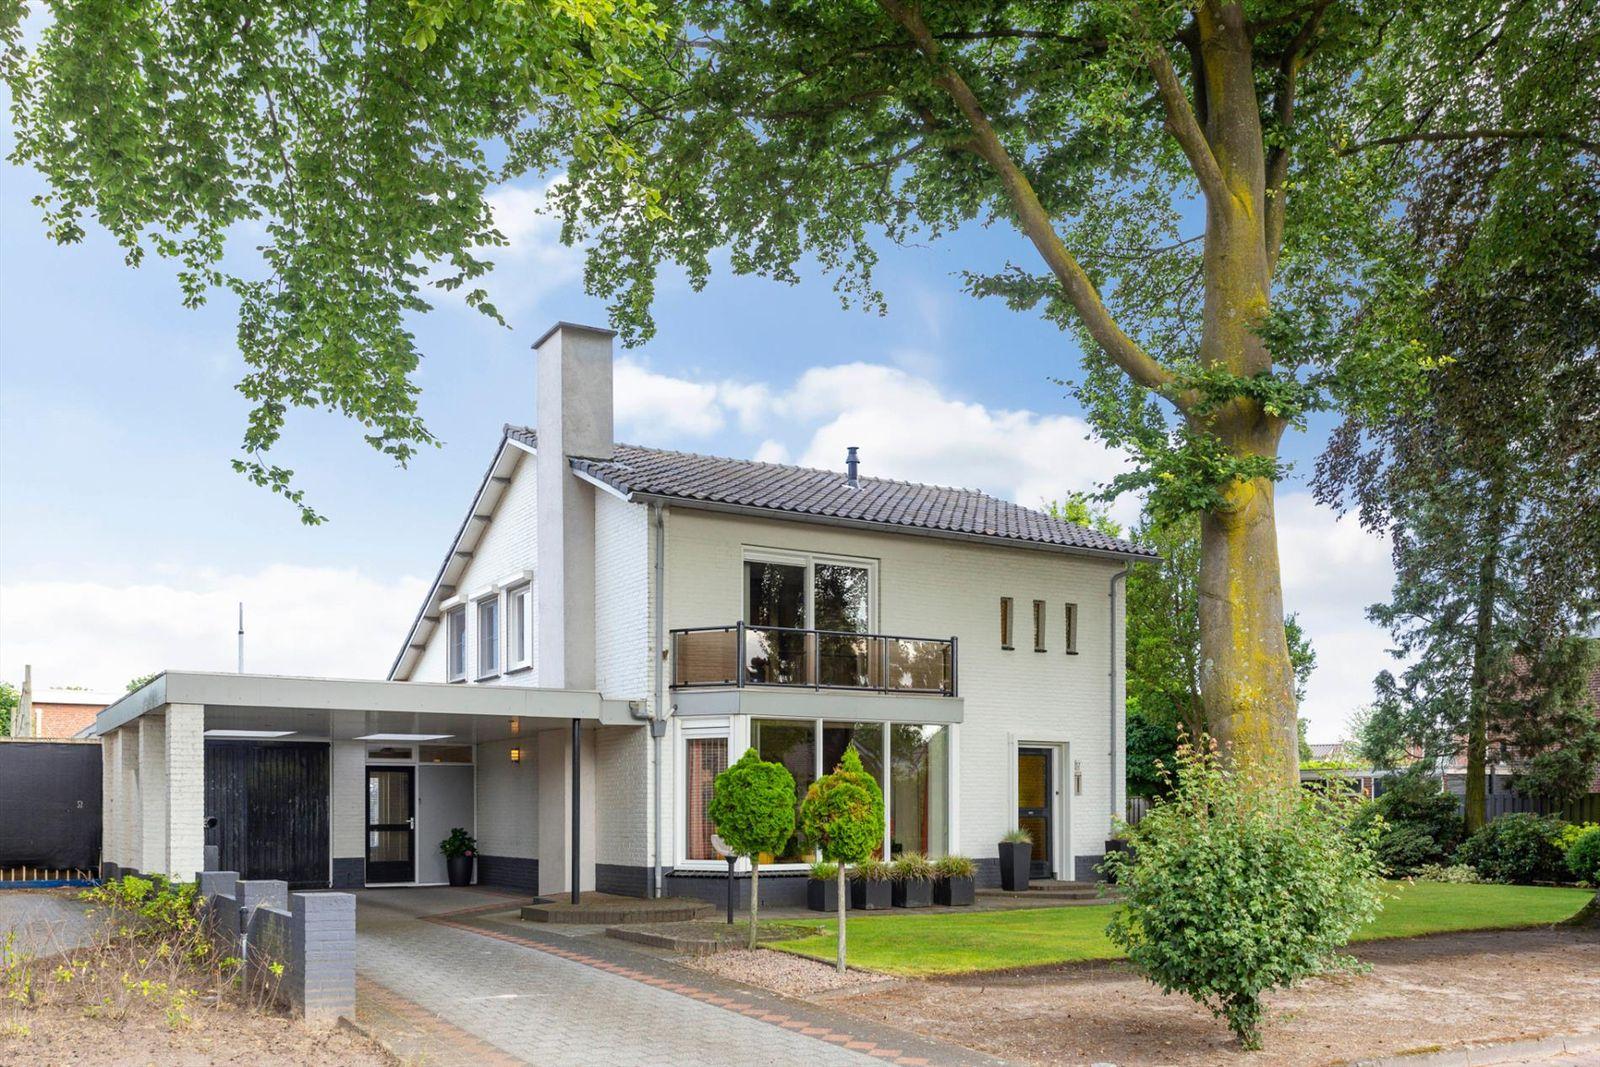 Willem II straat 17, Budel